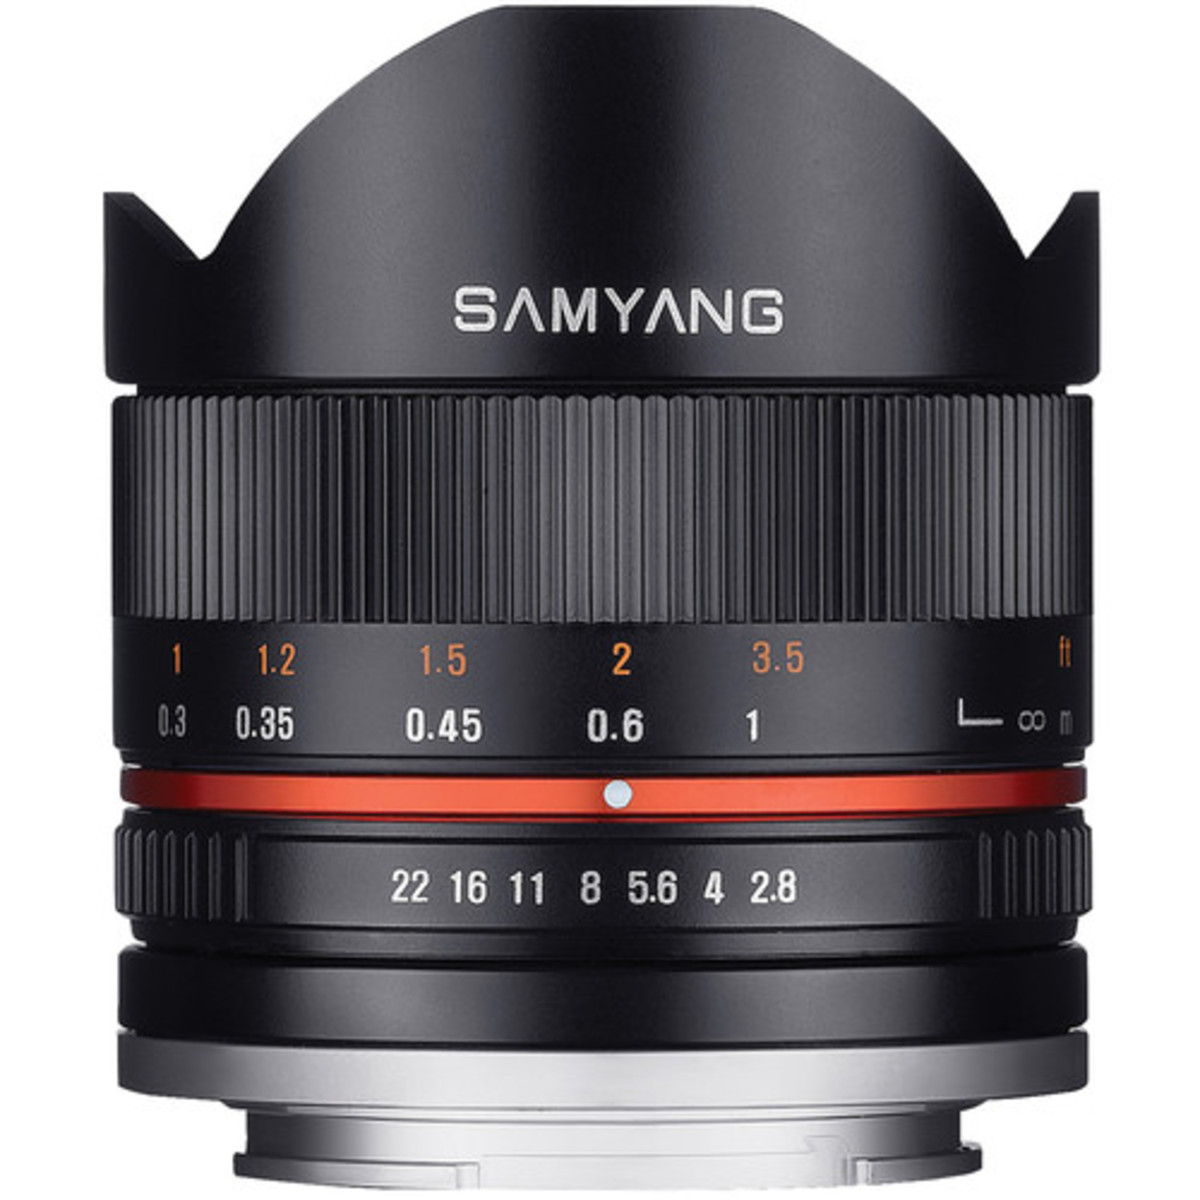 Samyang 8mm f/2.8 Fisheye II Lens - [For Fujifilm X Mount, Black] (Parallel imported)